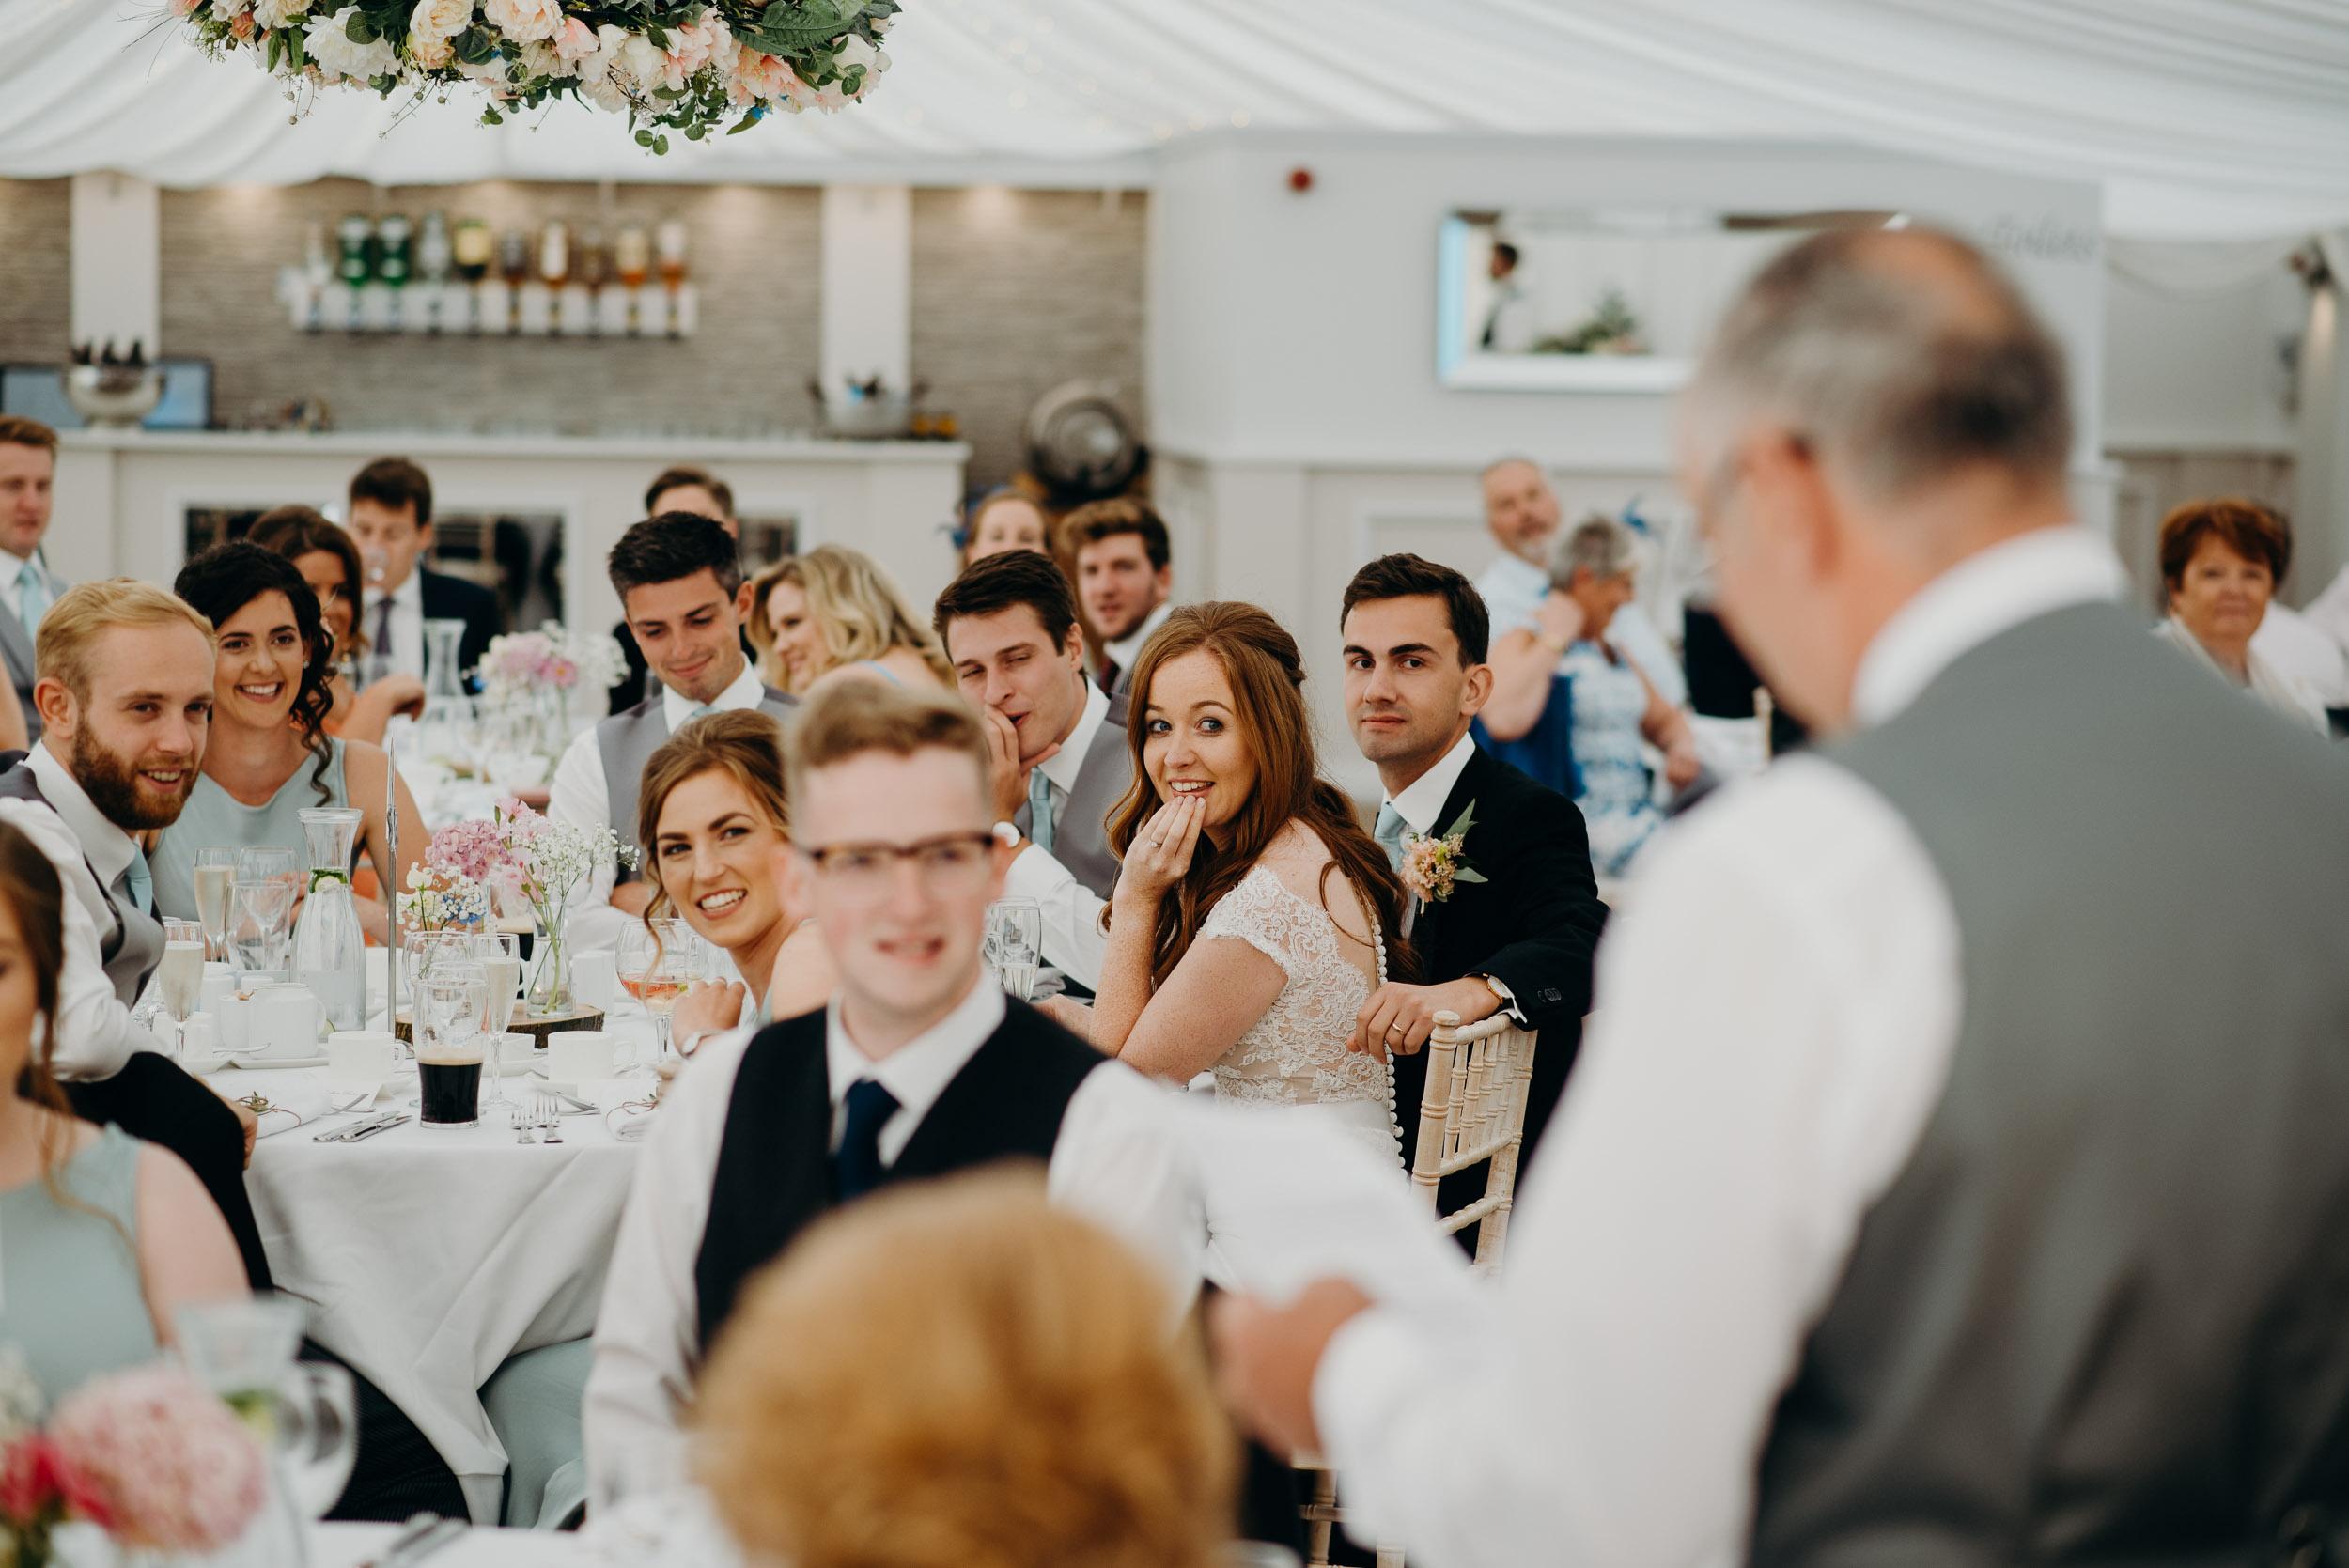 drenagh estate wedding photography-105.jpg